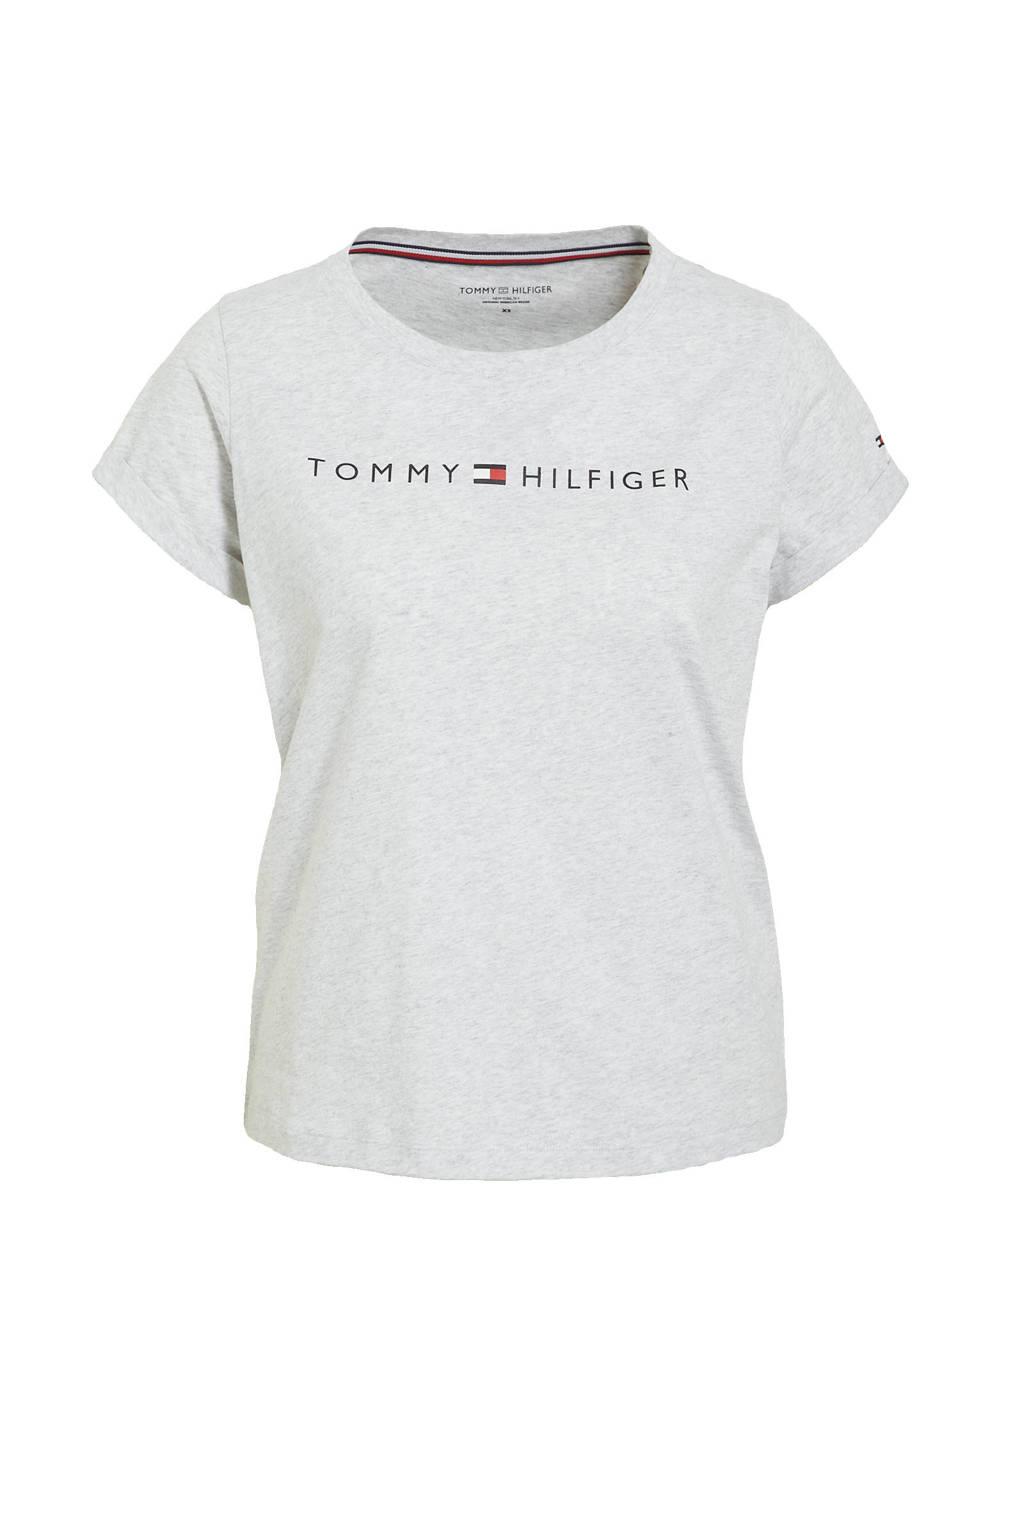 Tommy Hilfiger T-shirt met printopdruk grijs, Grijs